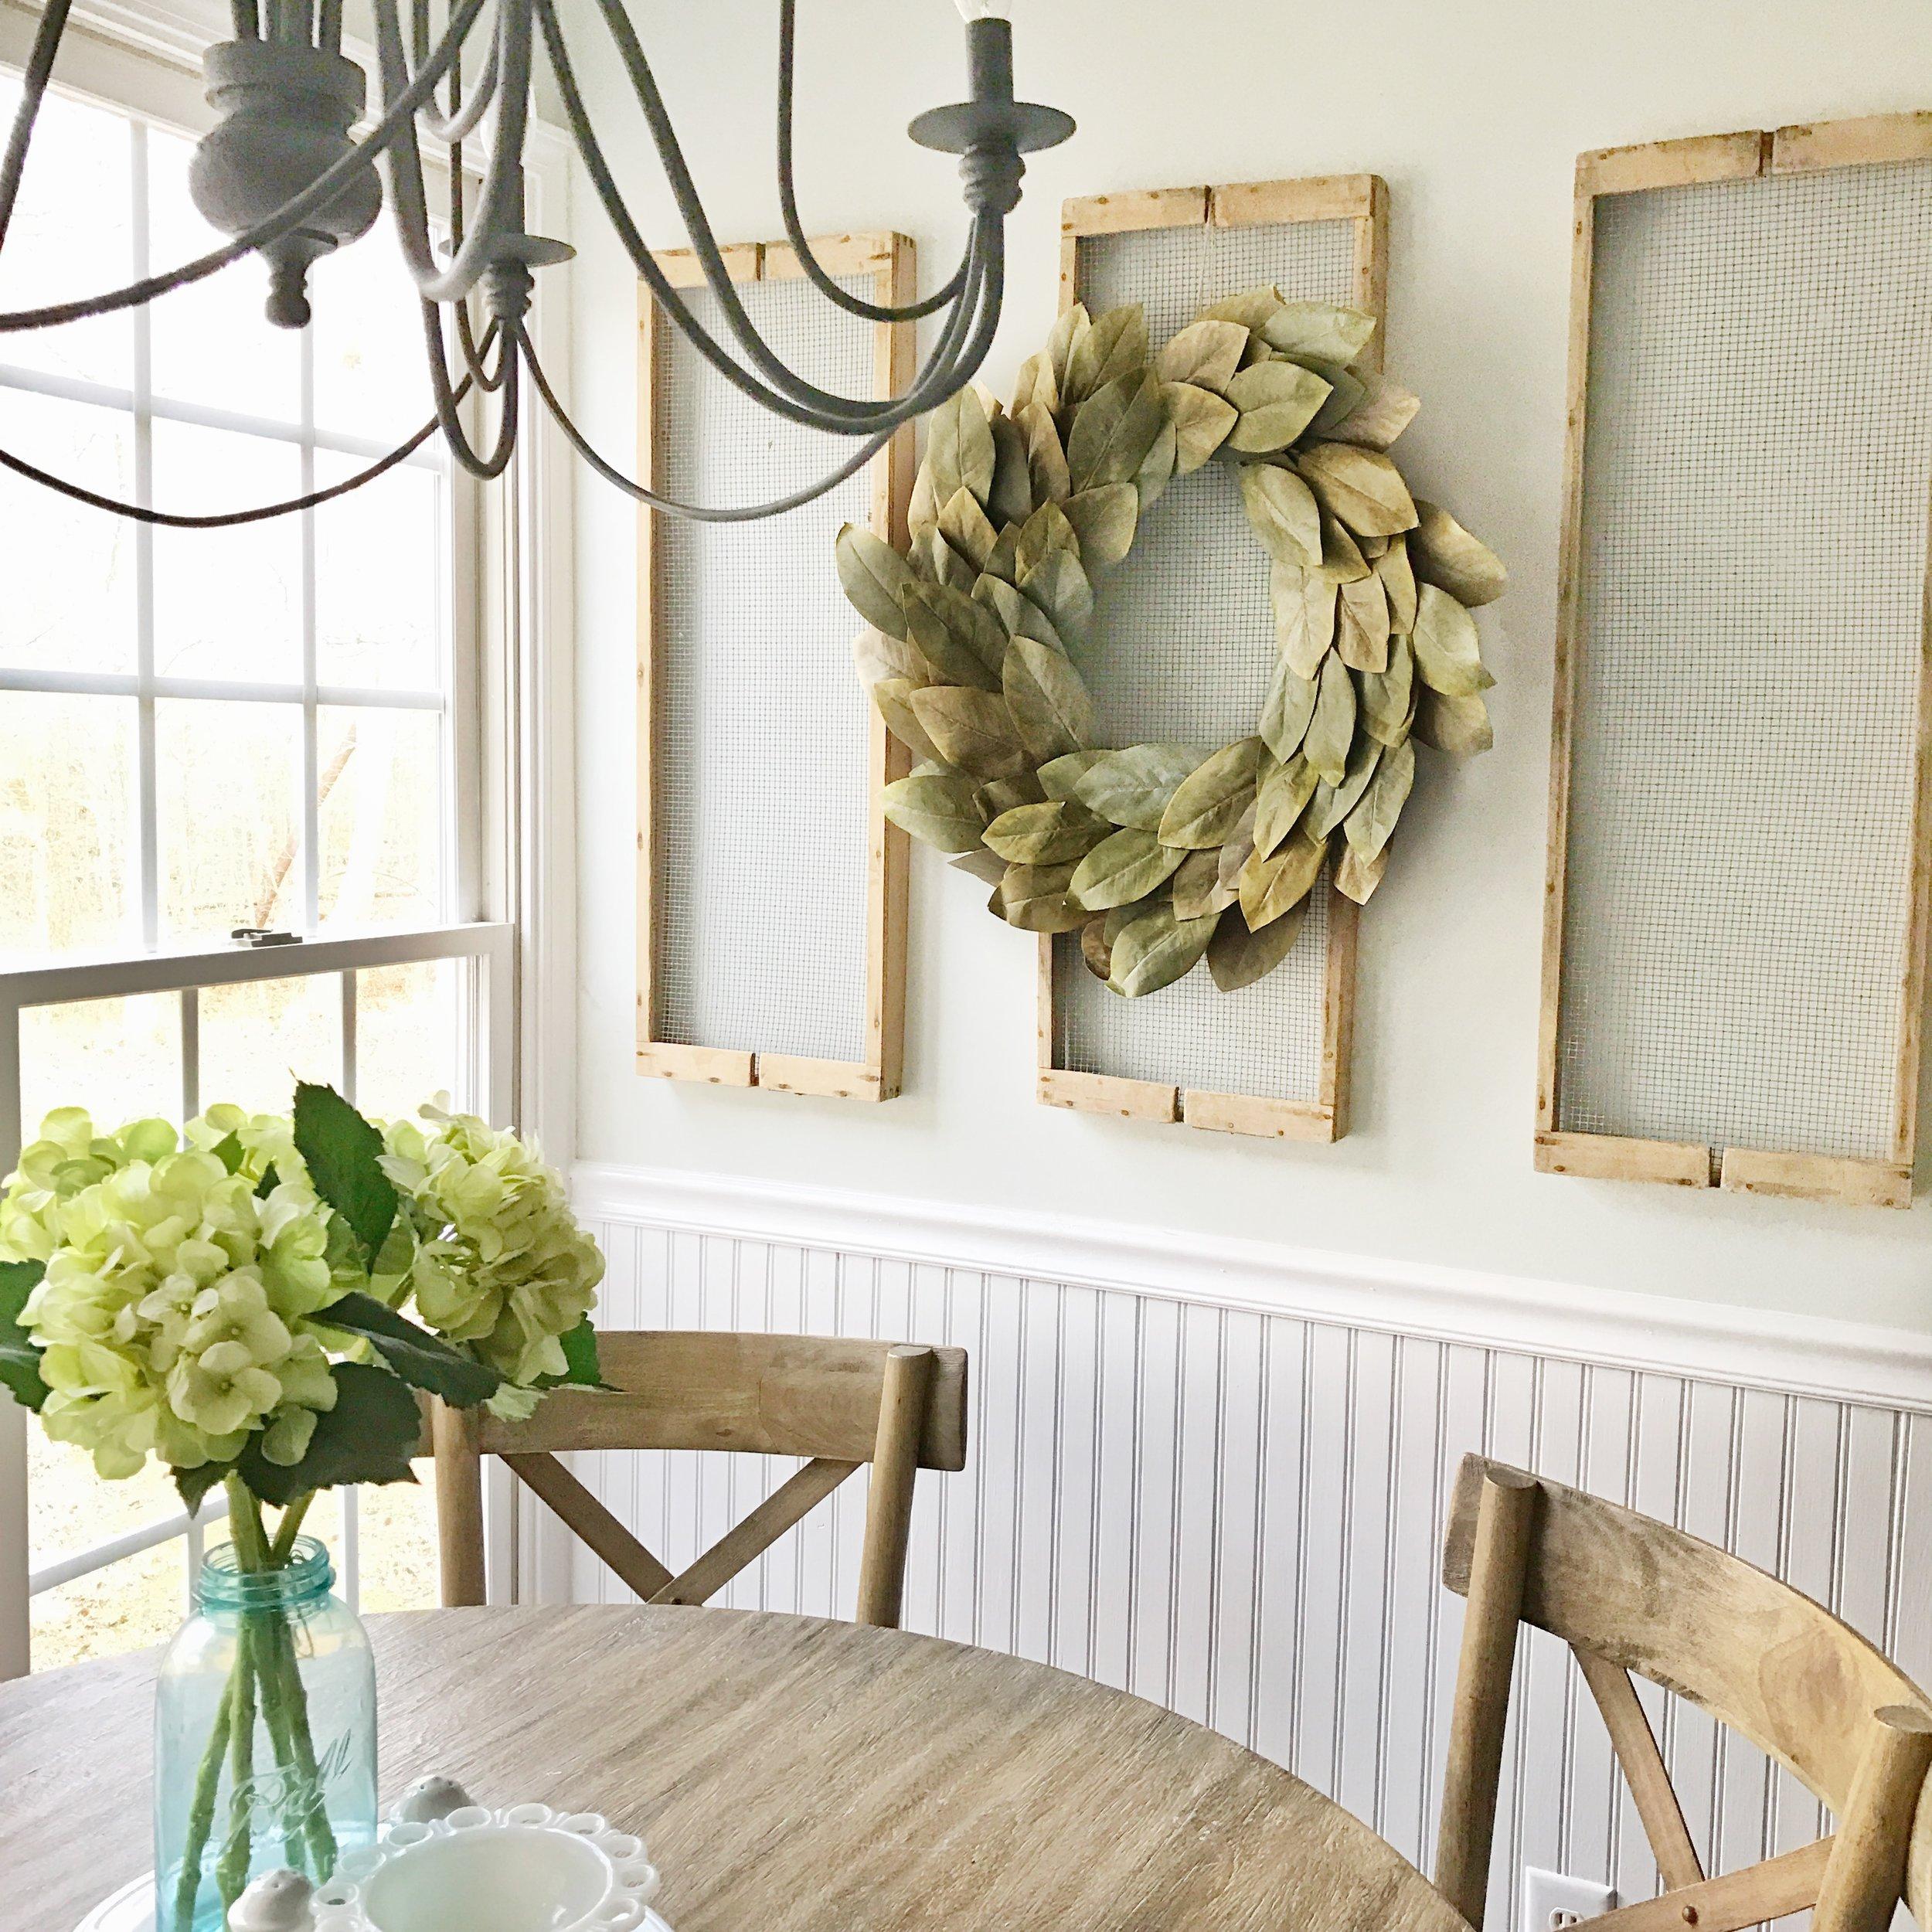 Breakfast Nook Wall Decor Refresh- Antique Drying Racks. Plum Pretty Decor and Design